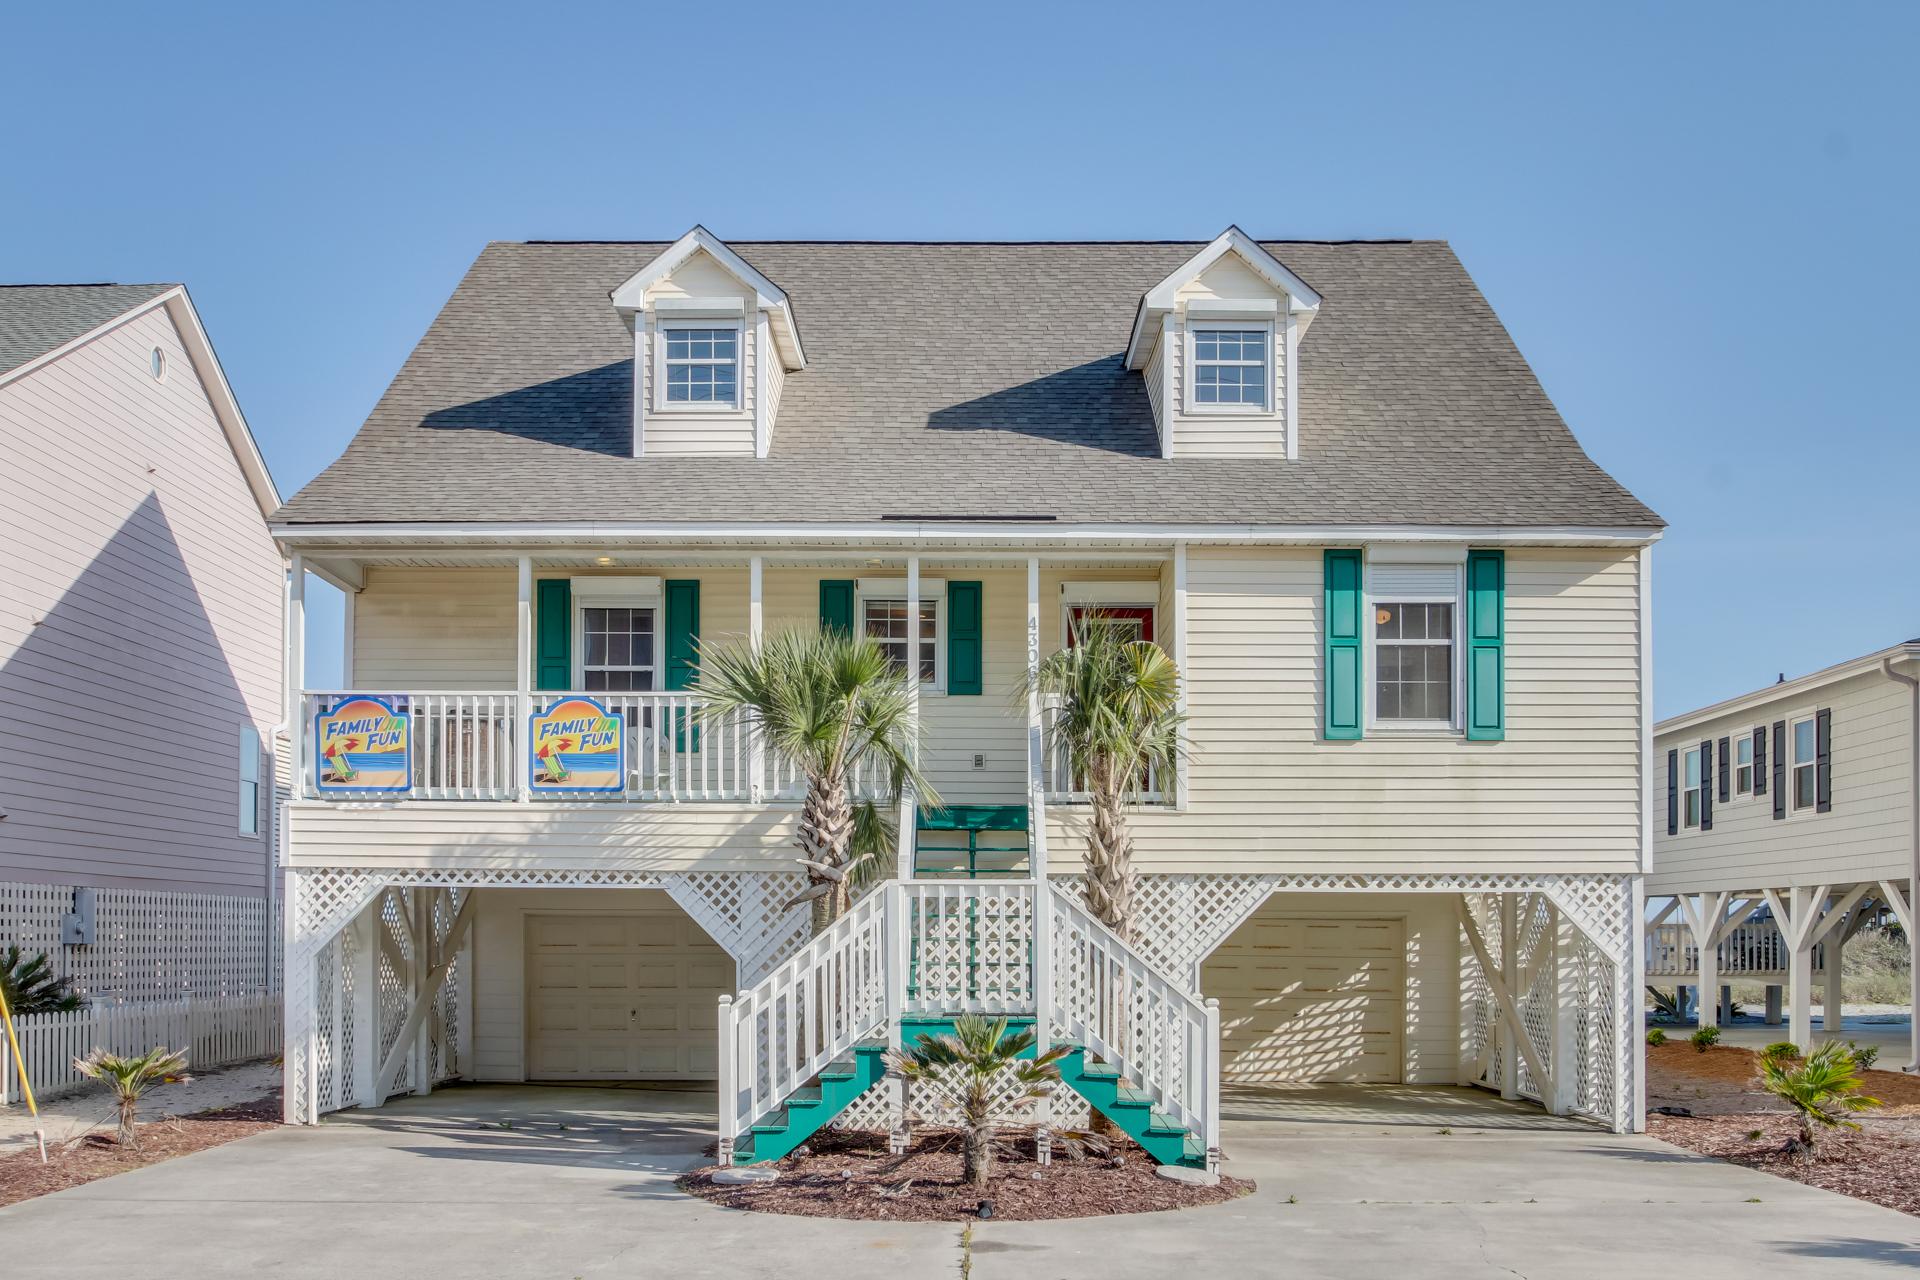 獨棟家庭住宅 為 出售 在 Surf and Sand 4306 N Ocean North Myrtle Beach, 南卡羅來納州, 29582 美國